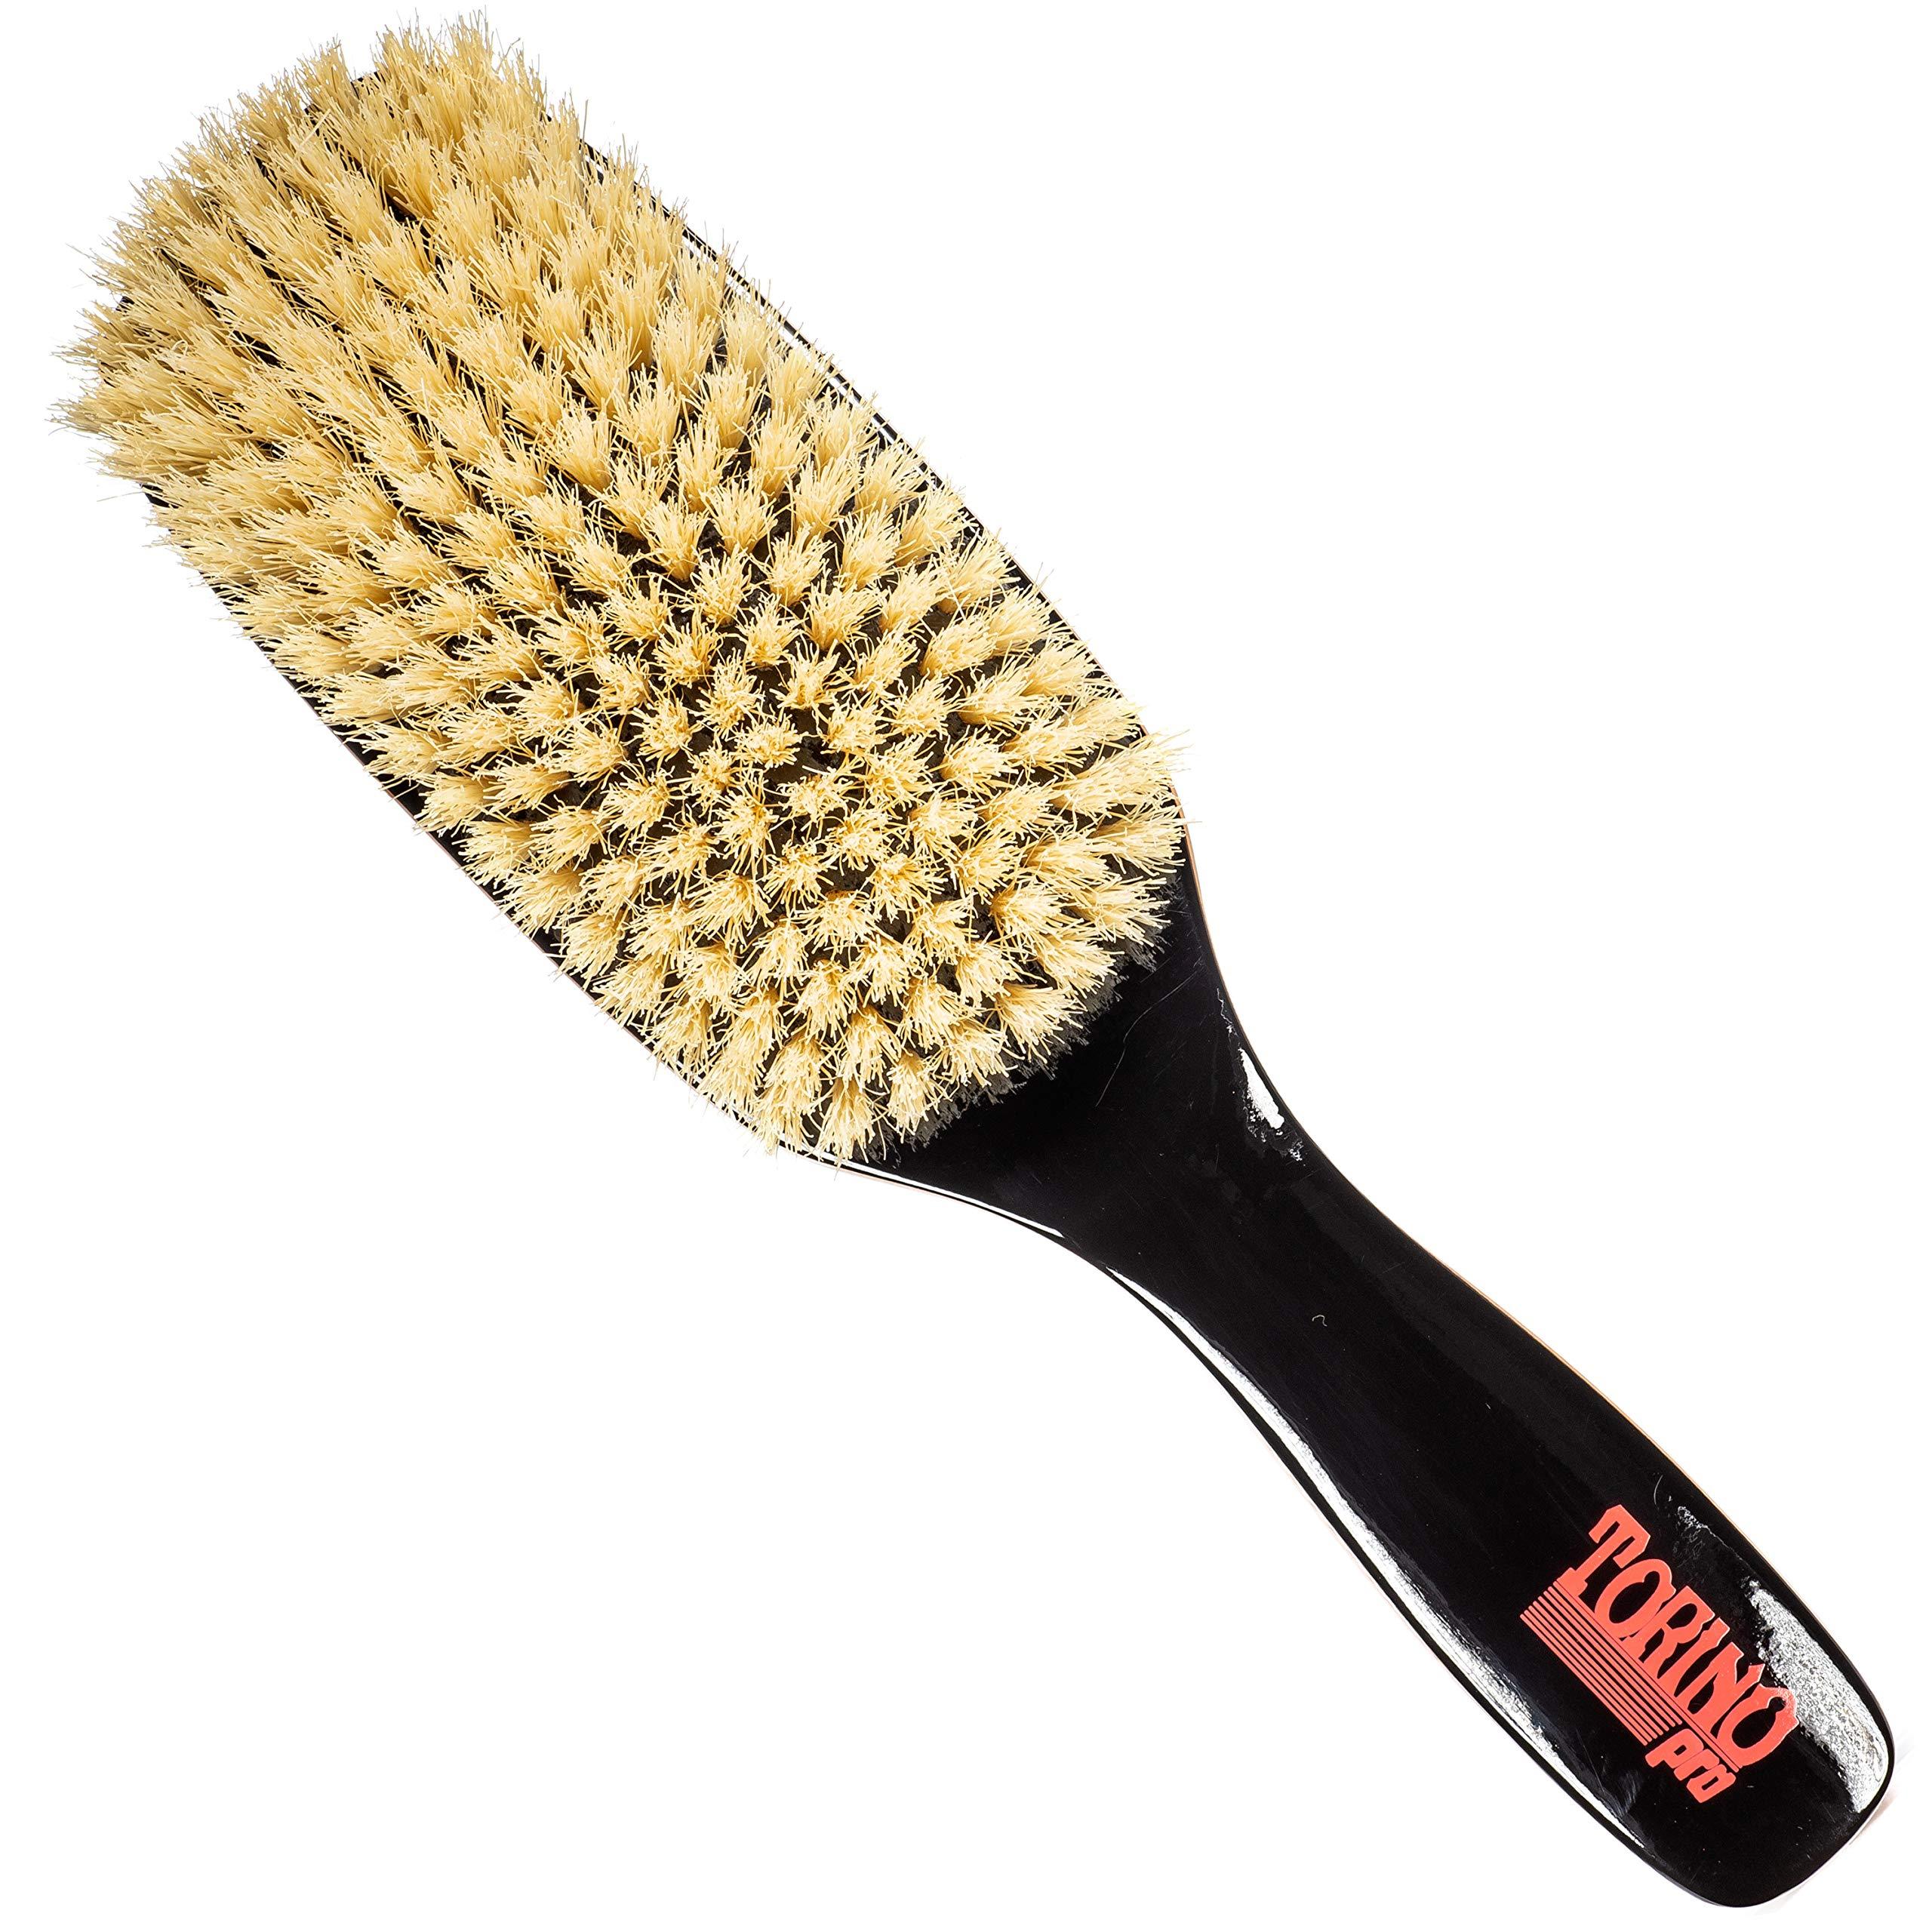 Torino Pro Soft Wave brush By Brush King - #1580- Duet